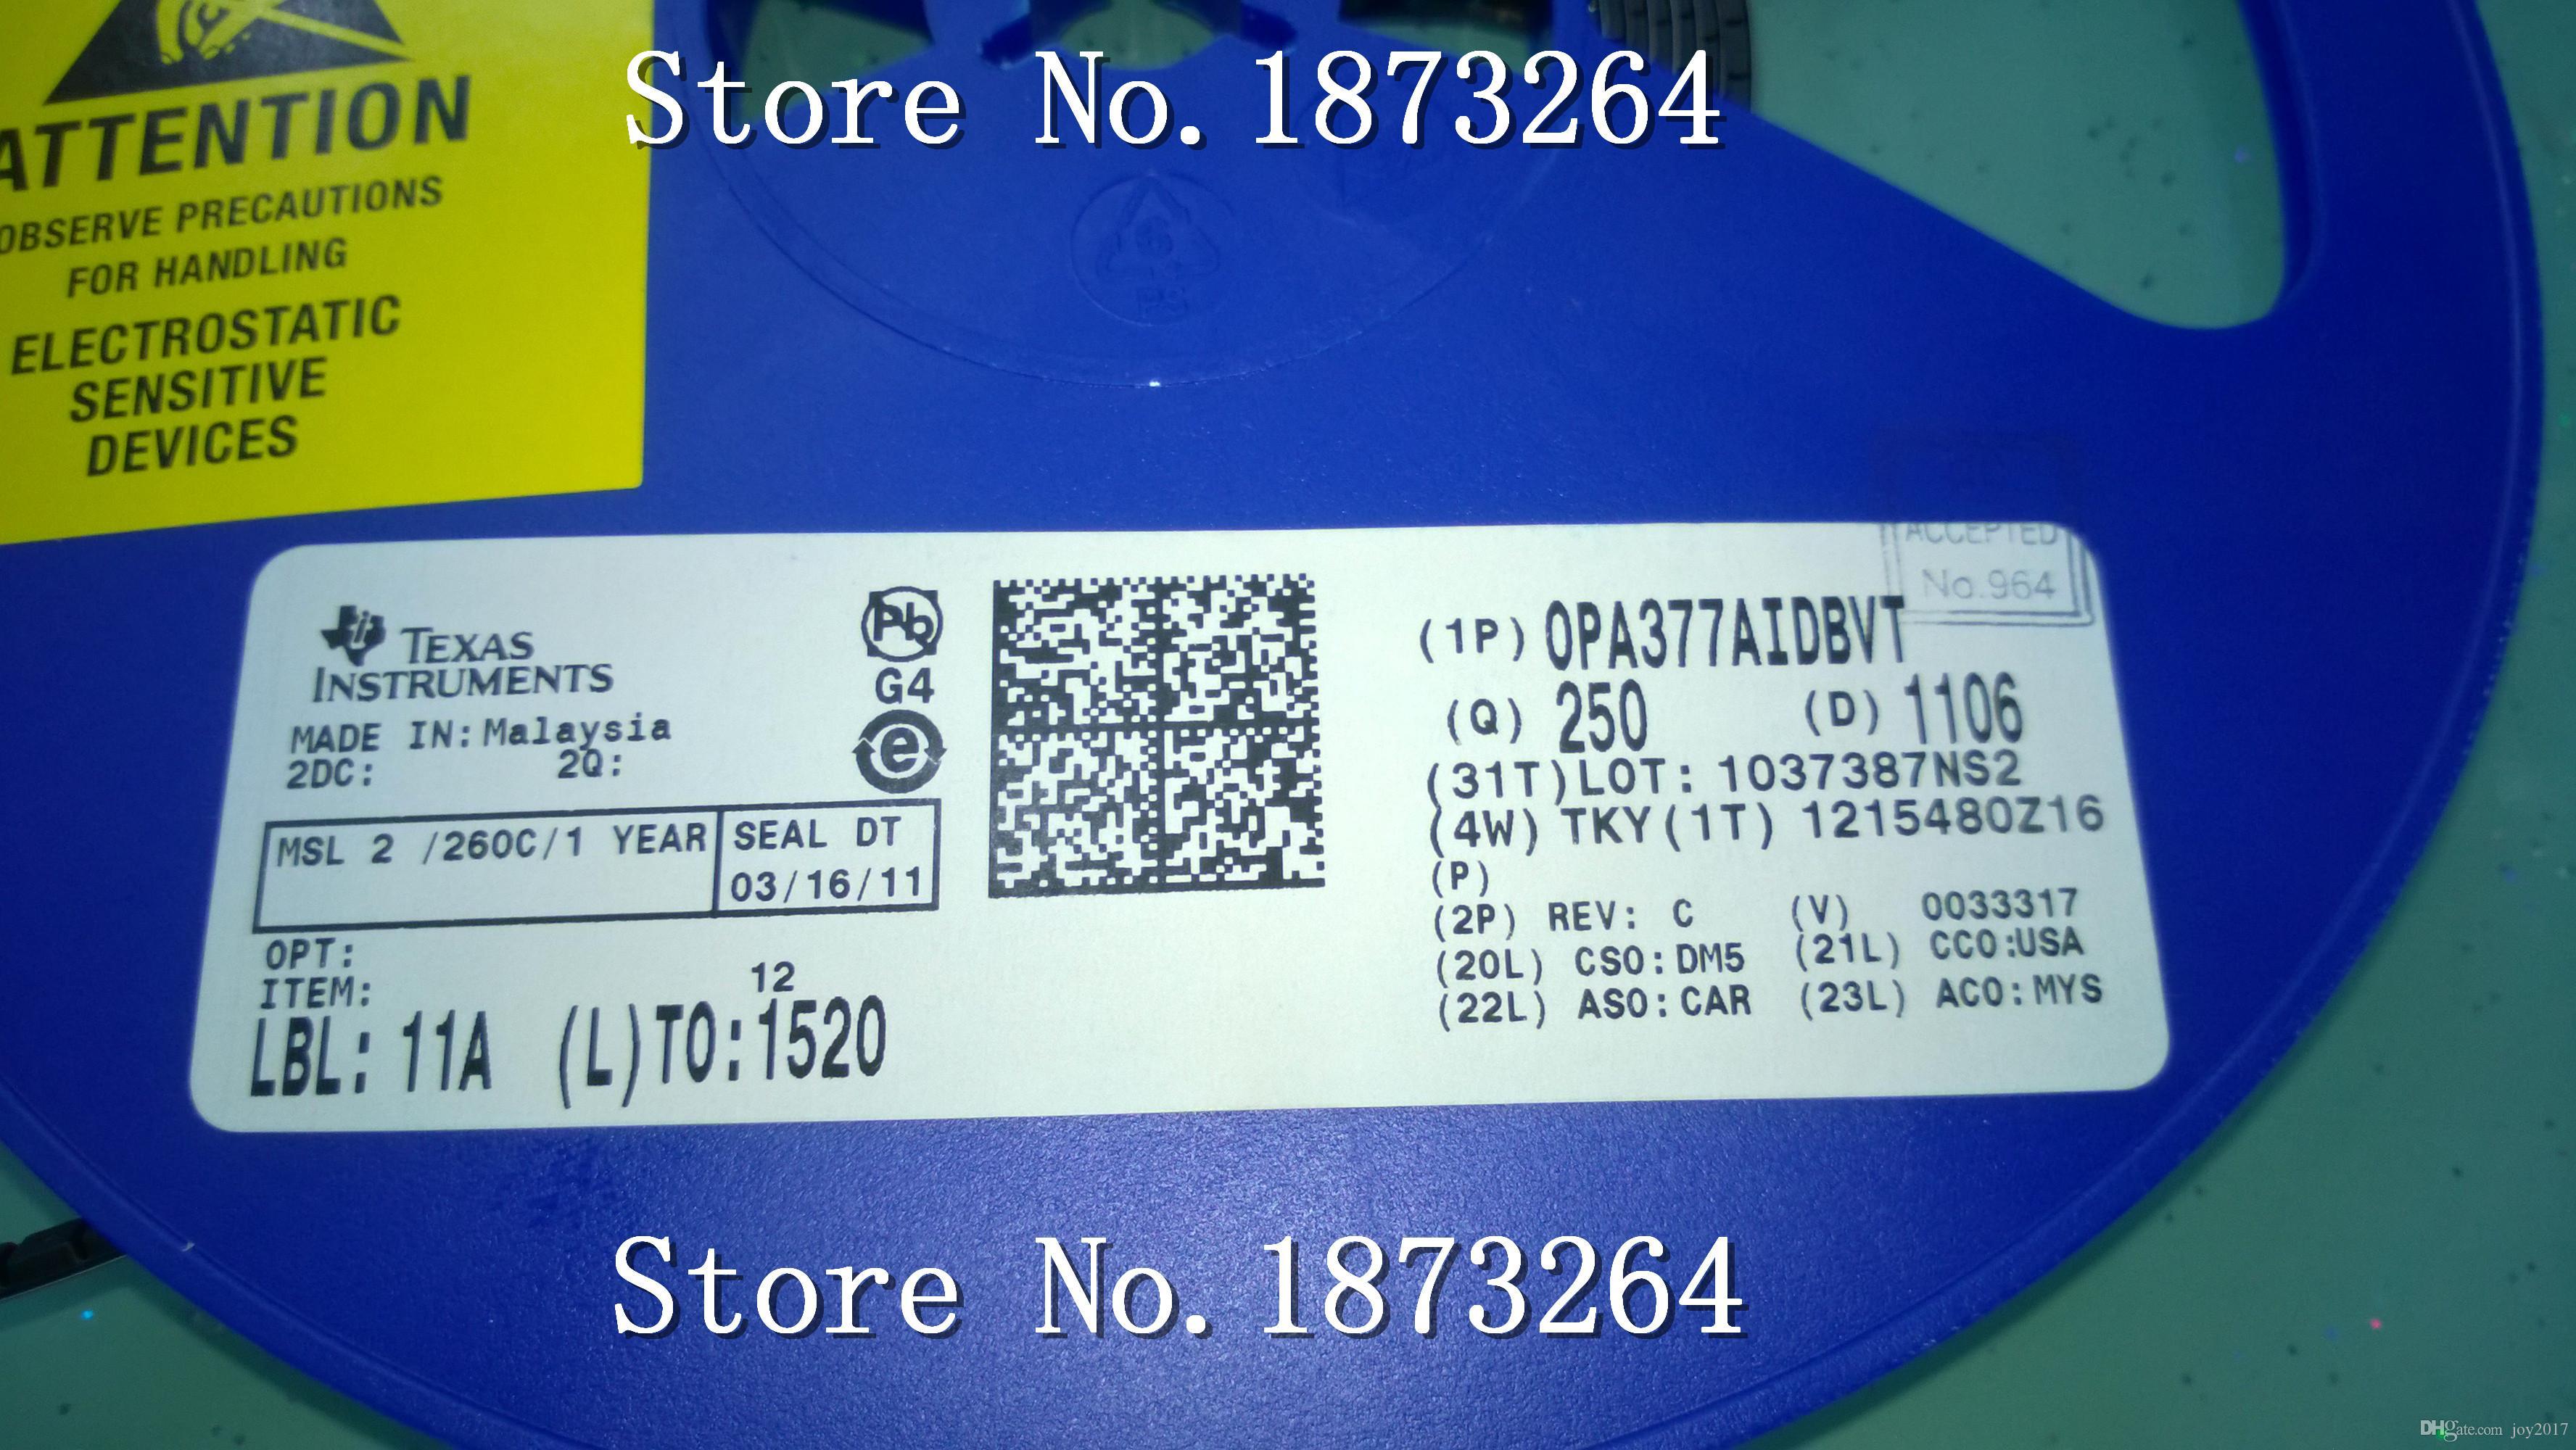 Ücretsiz kargo OPA377AIDBVT OPA377AIDBVR OPA377AIDBV SOT-23 Cihazı Işaretleme: PAG Yeni ve Orijinal 10 ADET / GRUP